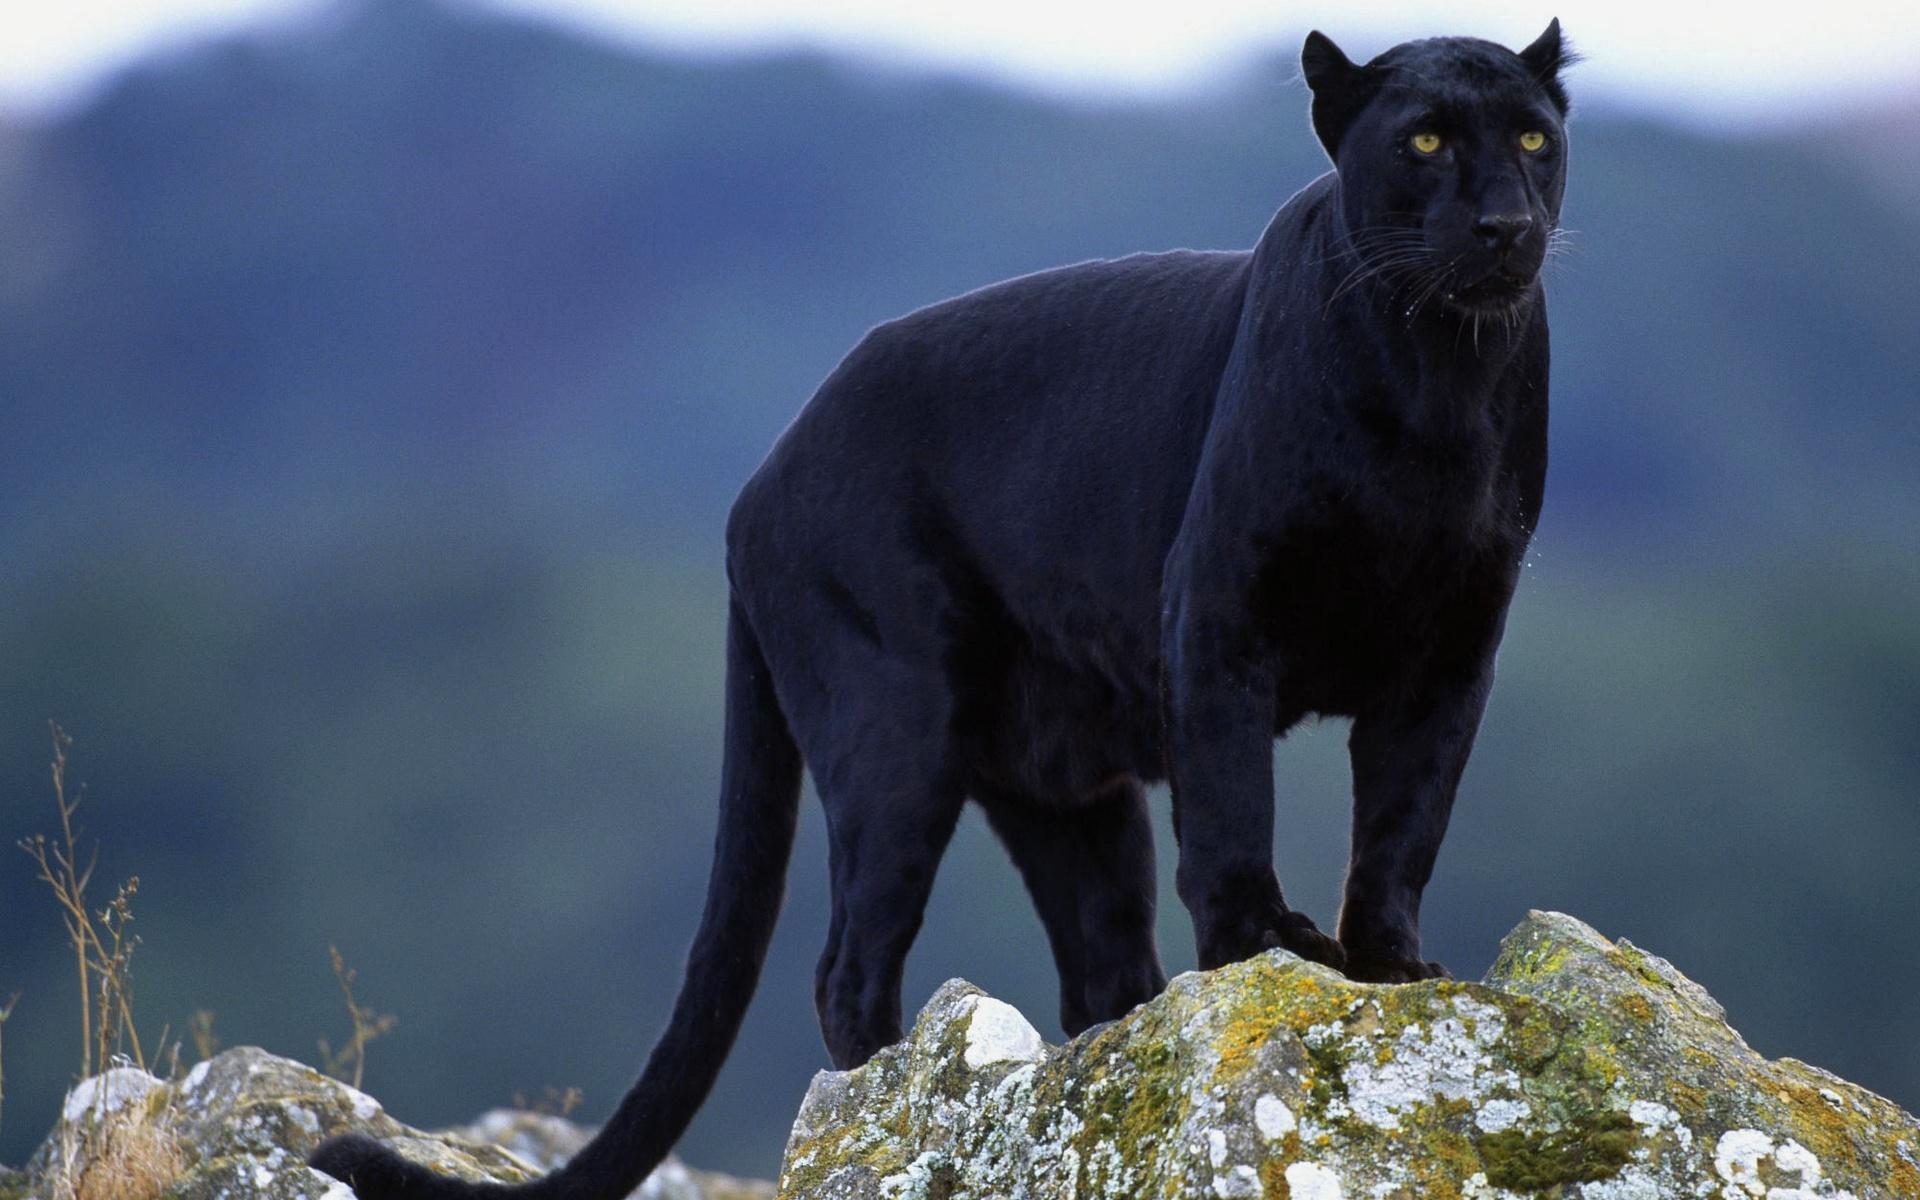 найдем картинки пантер ягуаров пум когда года